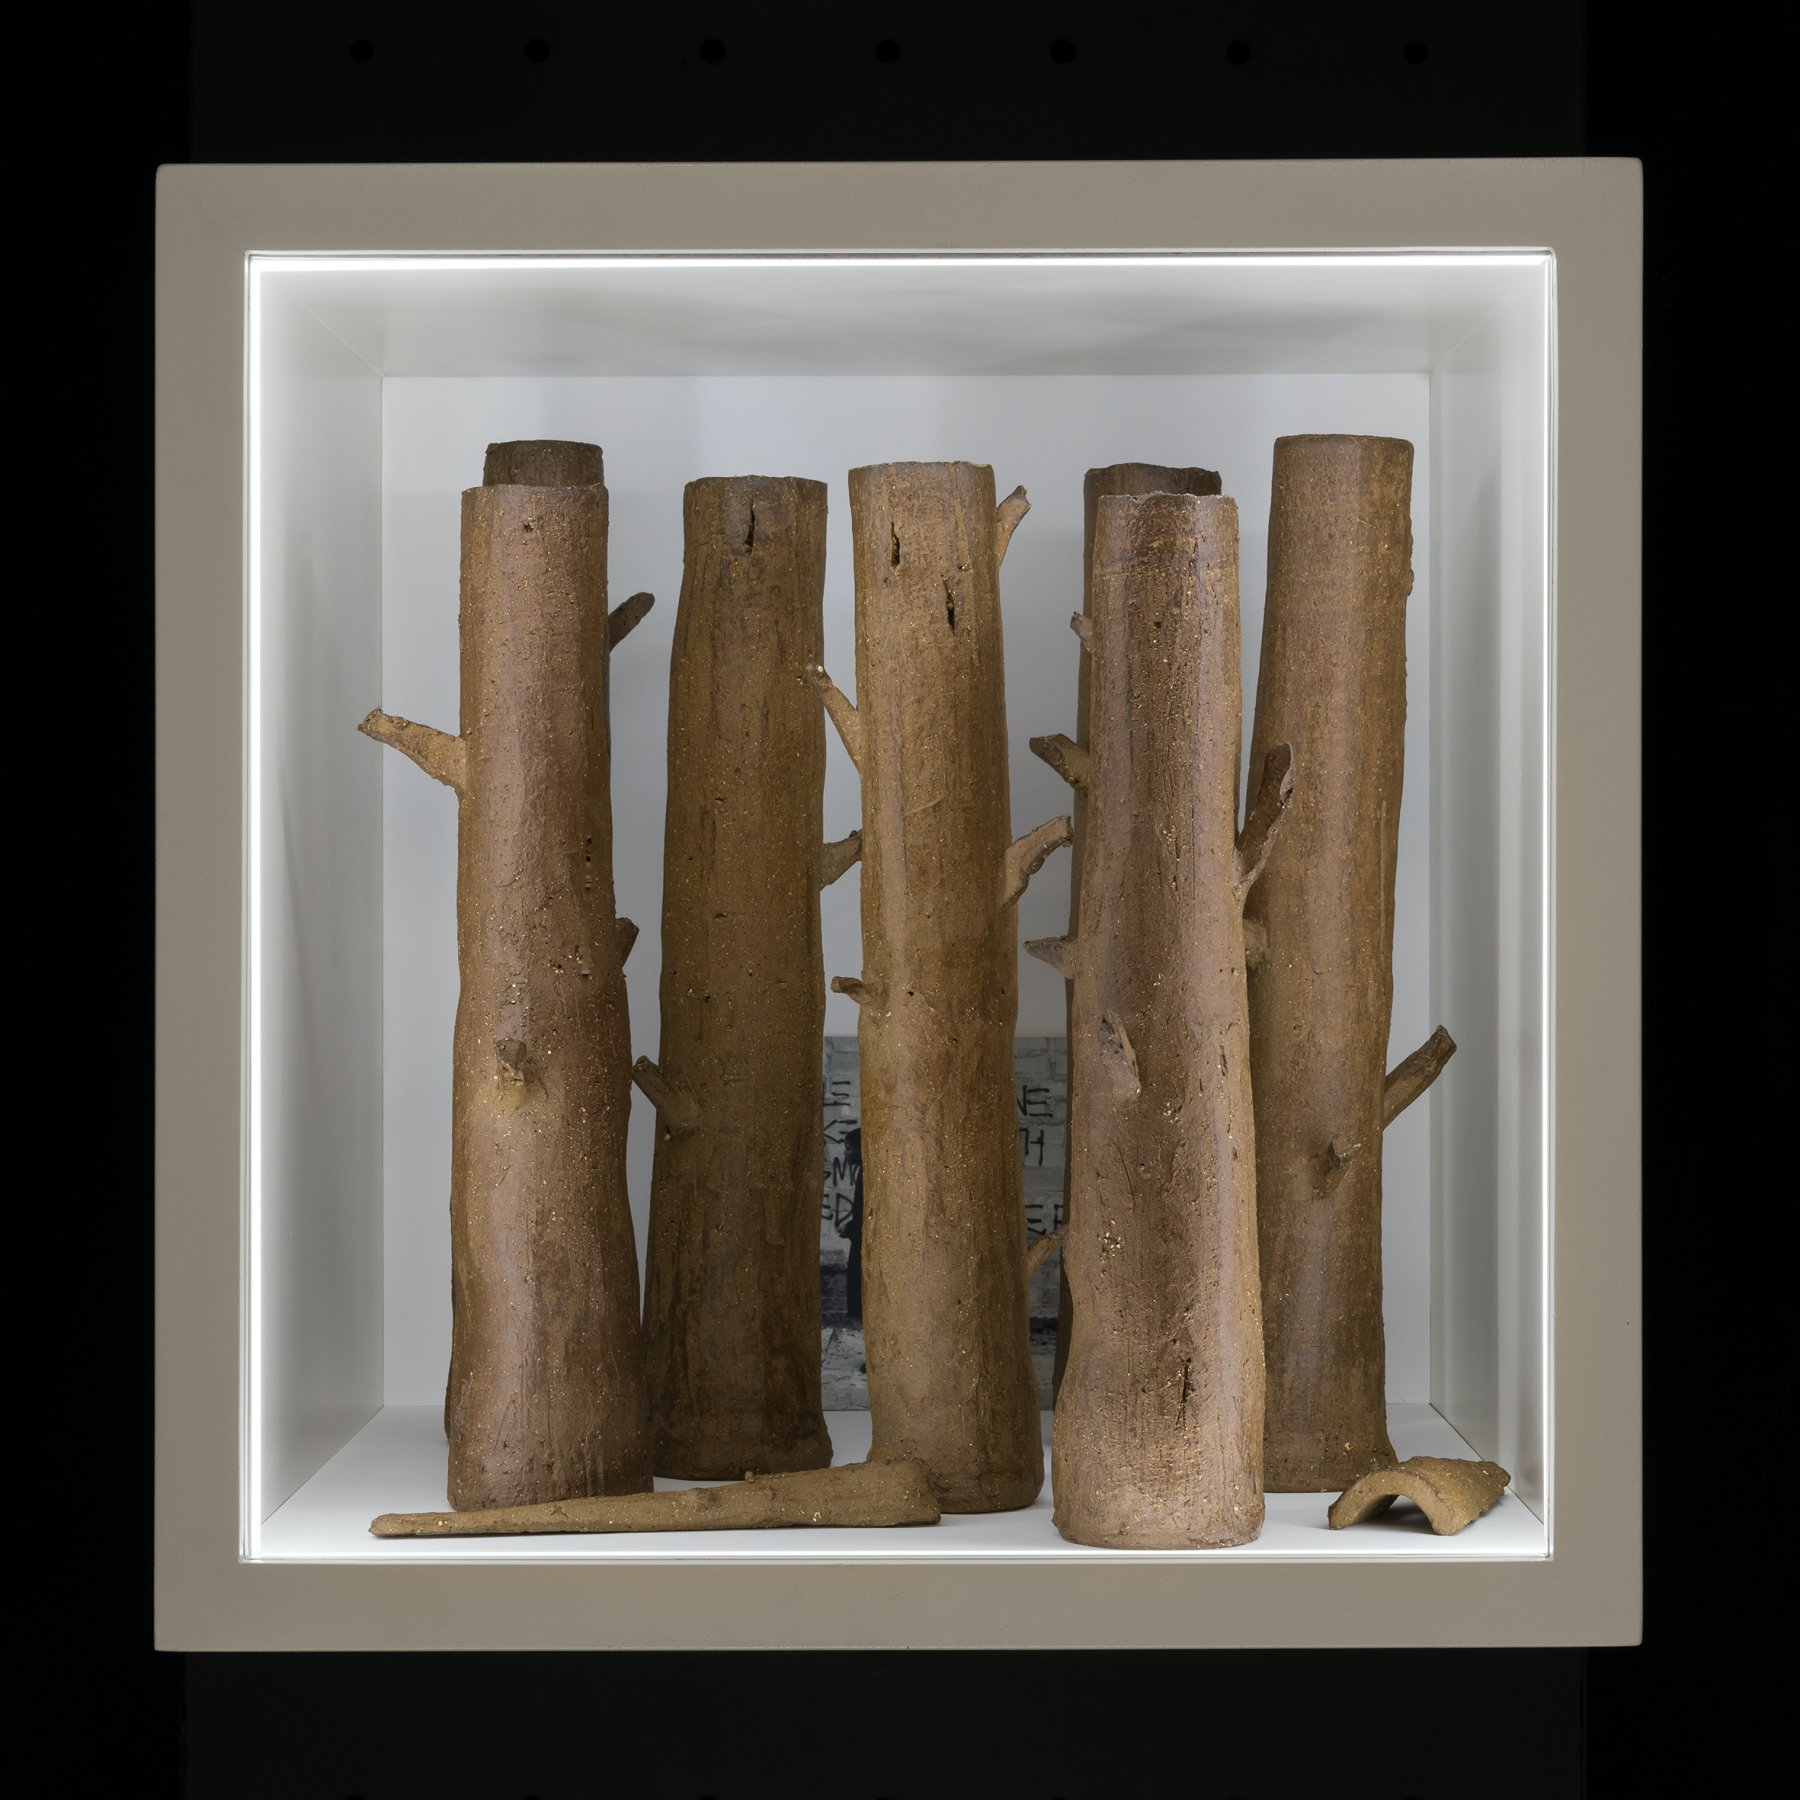 Pippy Houldsworth Gallery Tommaso Corvi-Mora 2